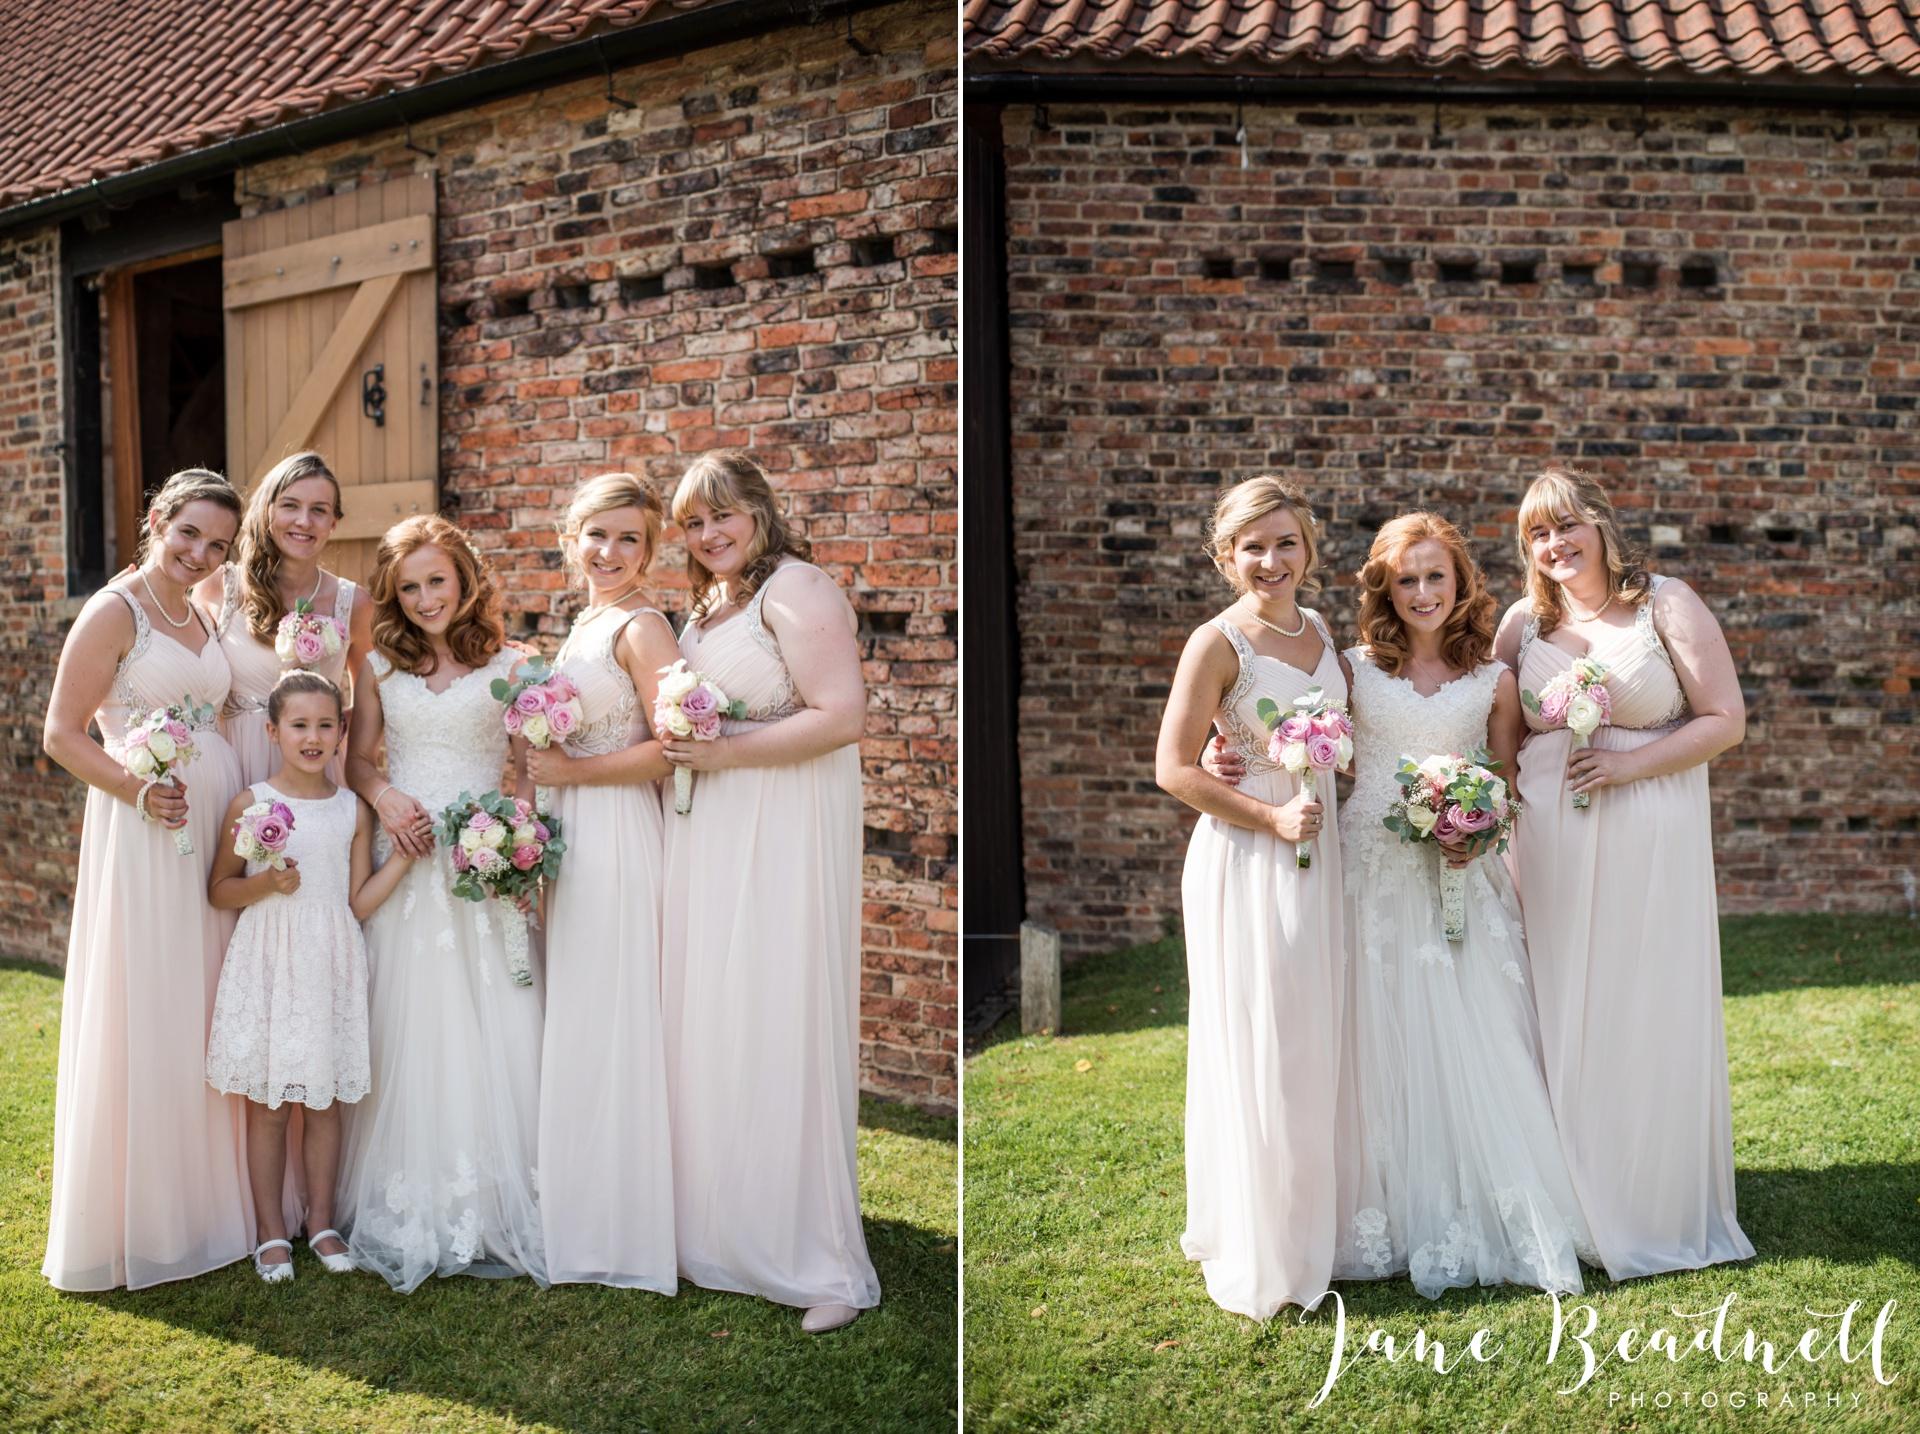 yorkshire-fine-art-wedding-photographer-jane-beadnell-photography-poppleton-york_0096